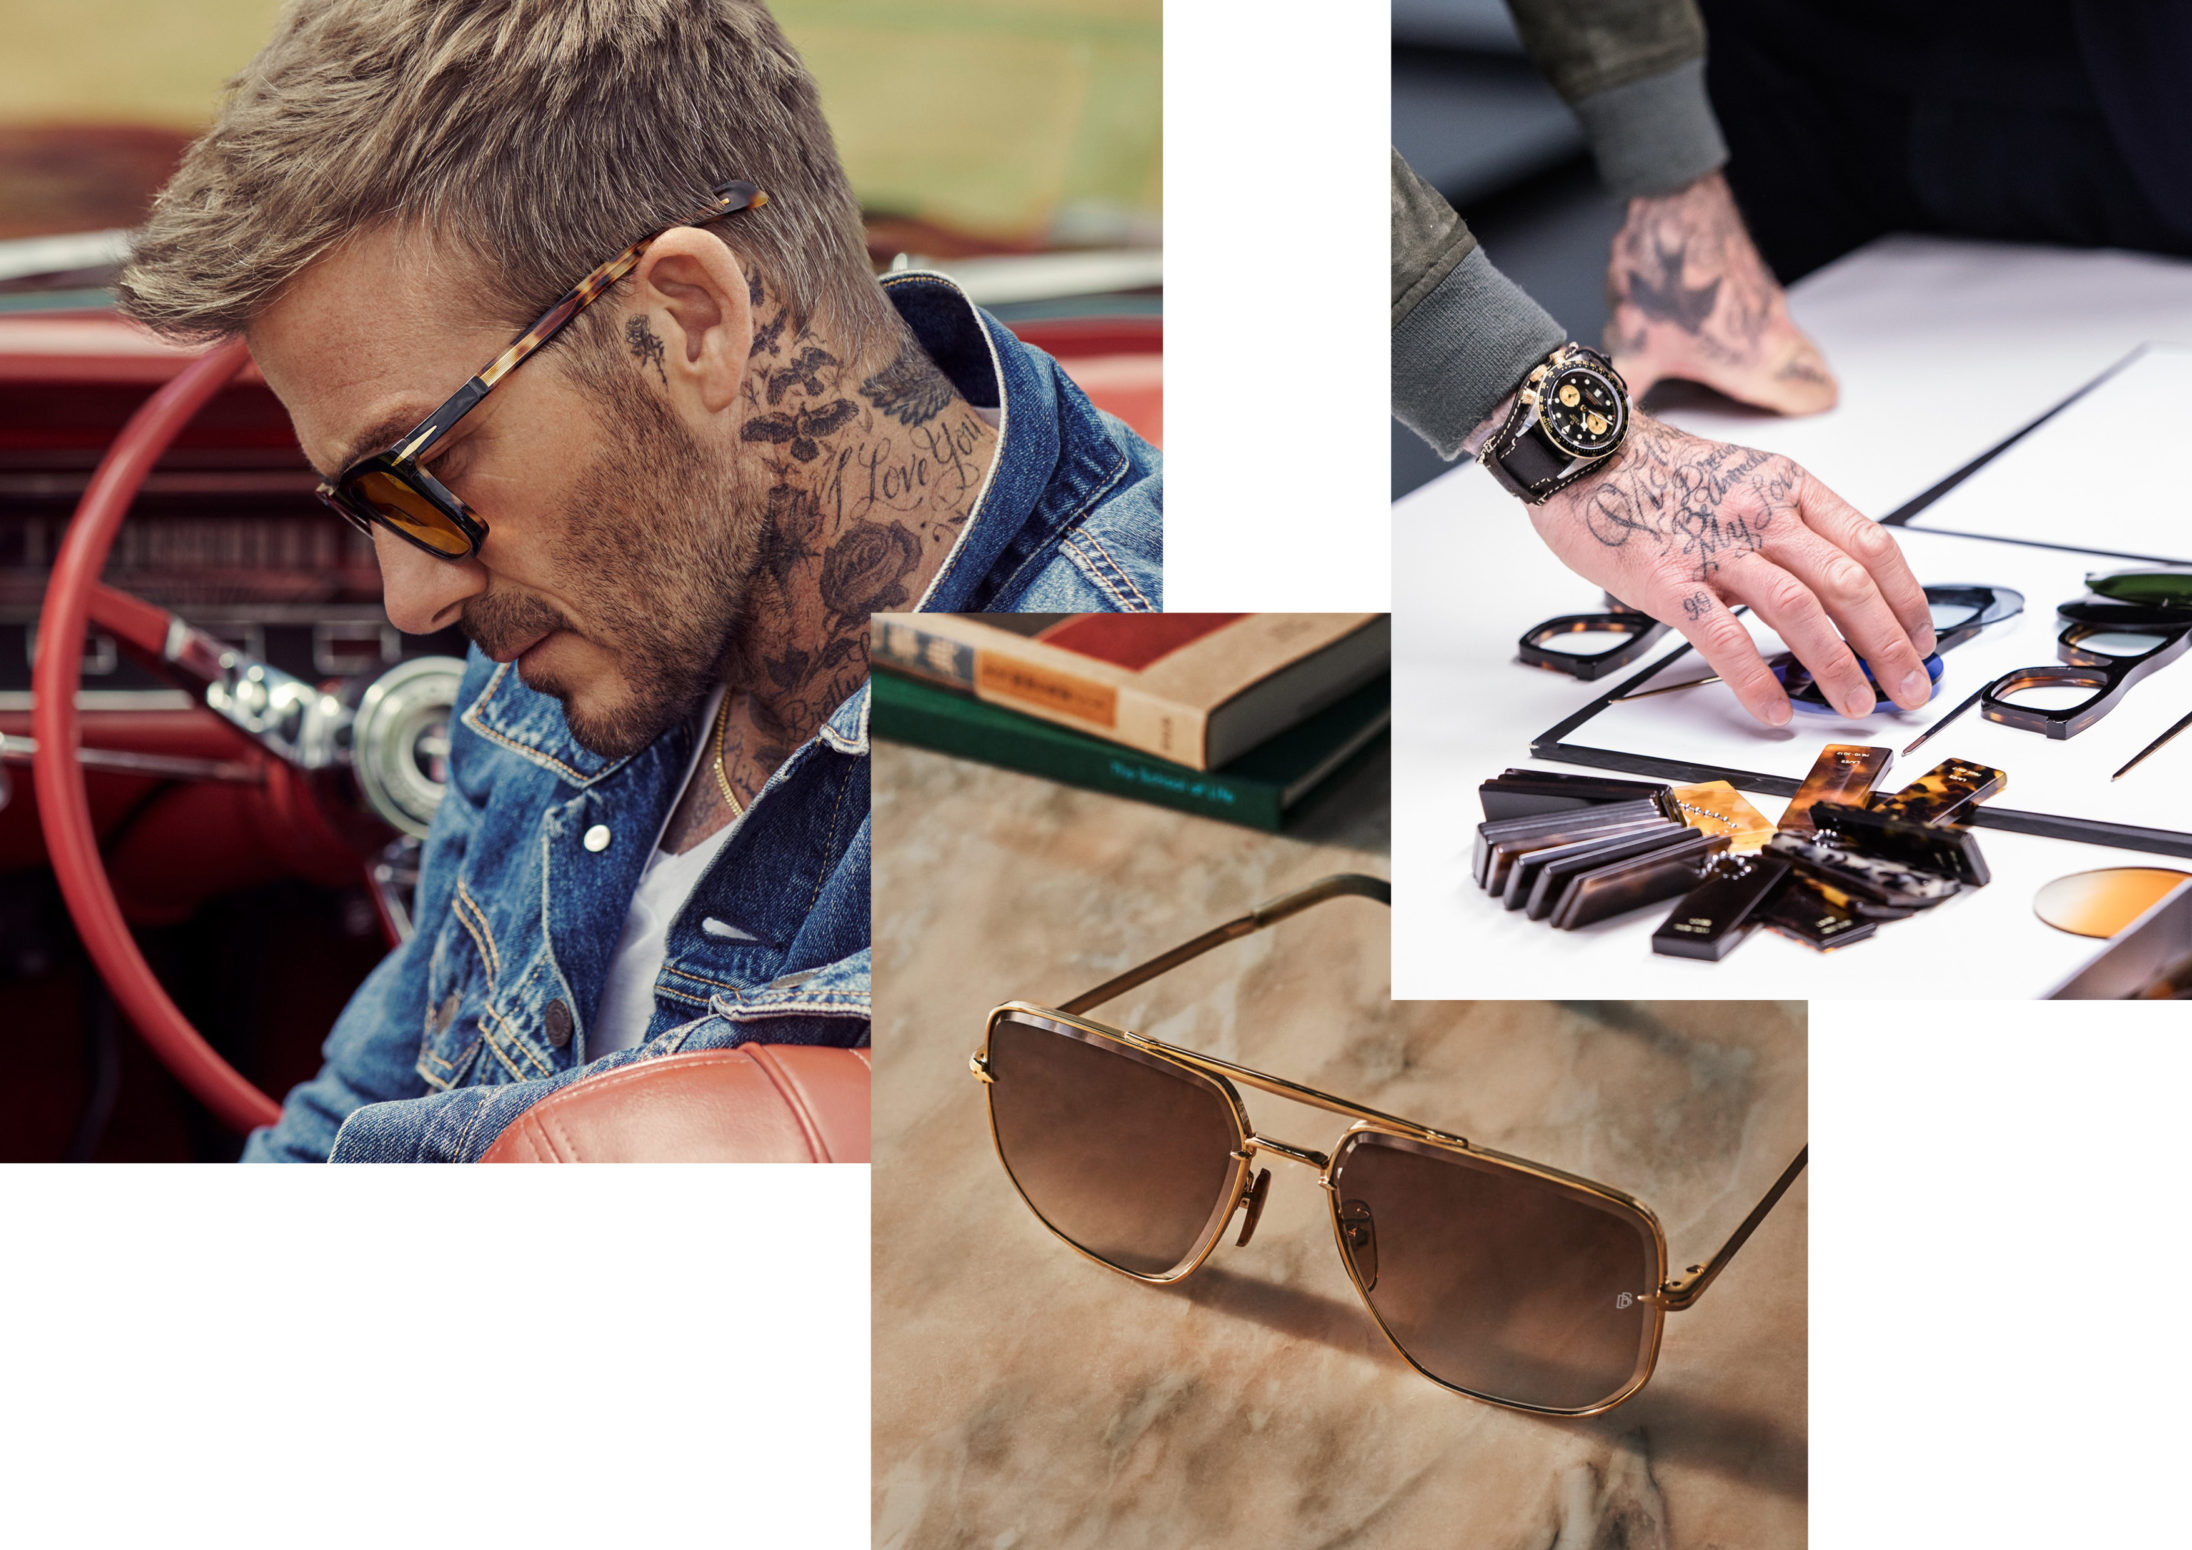 David Beckham eyewear zomer 2020 - optiek Lammerant